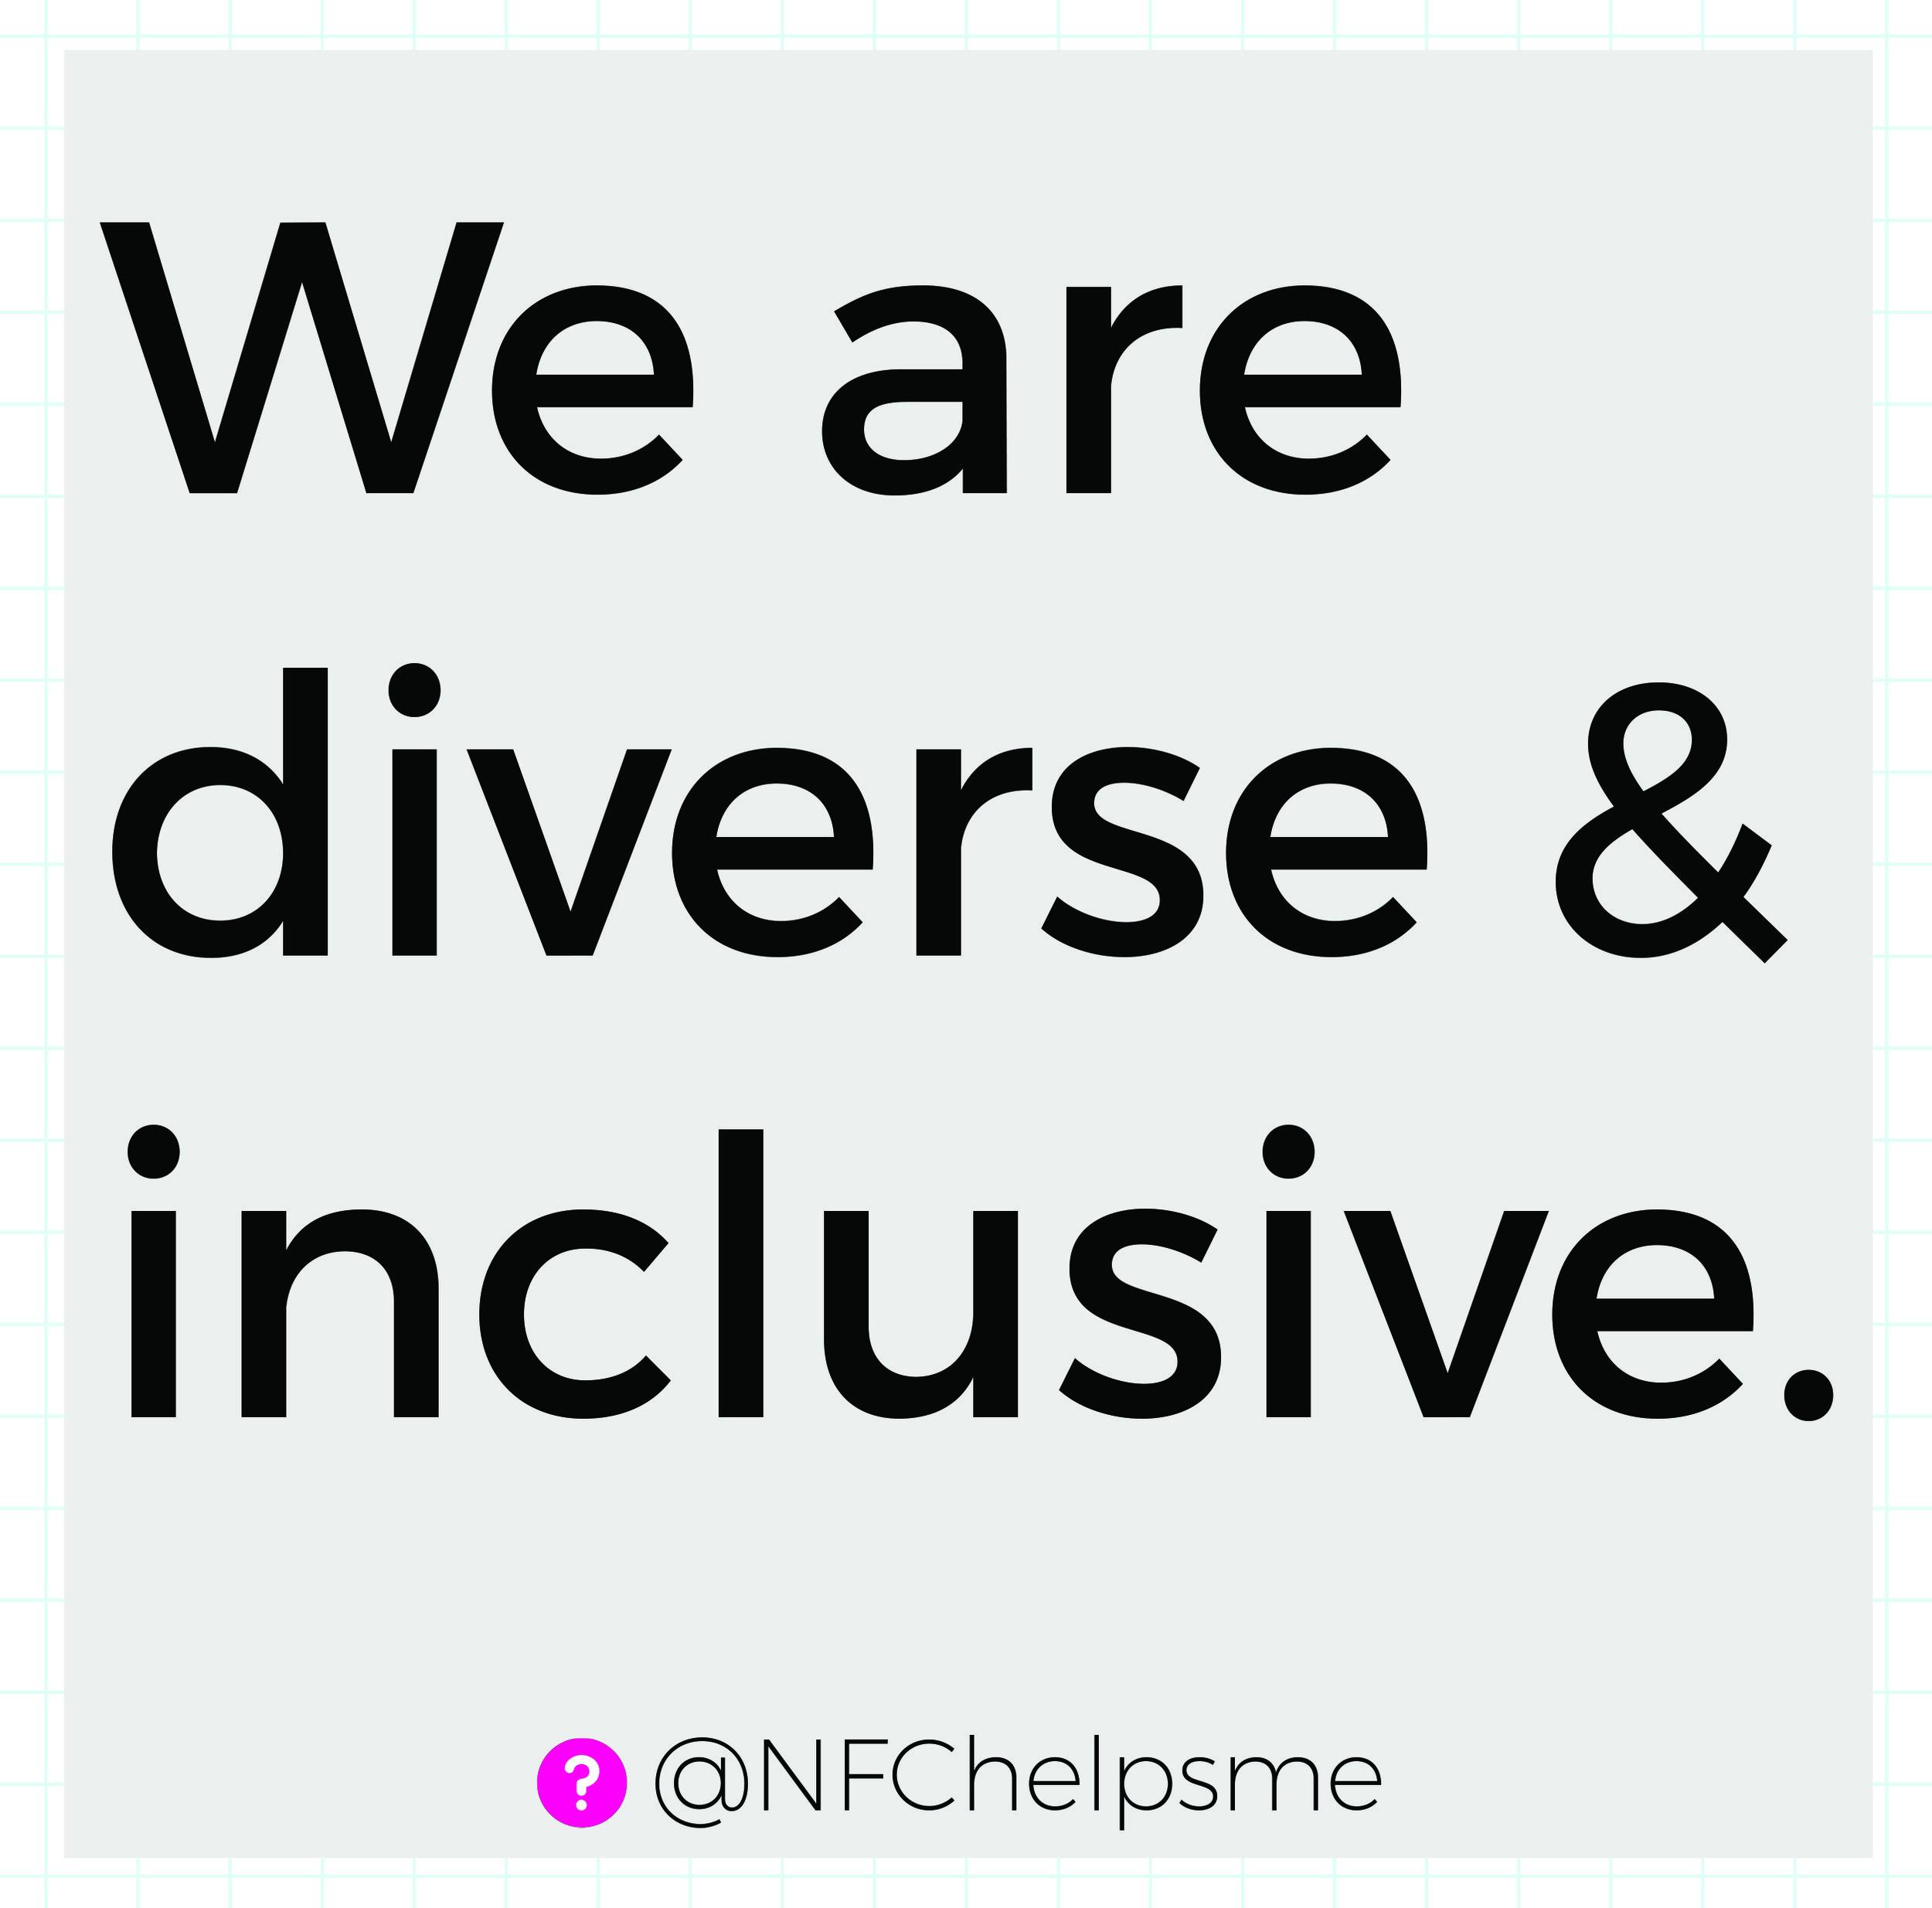 Wearediverse&inclusive.jpg